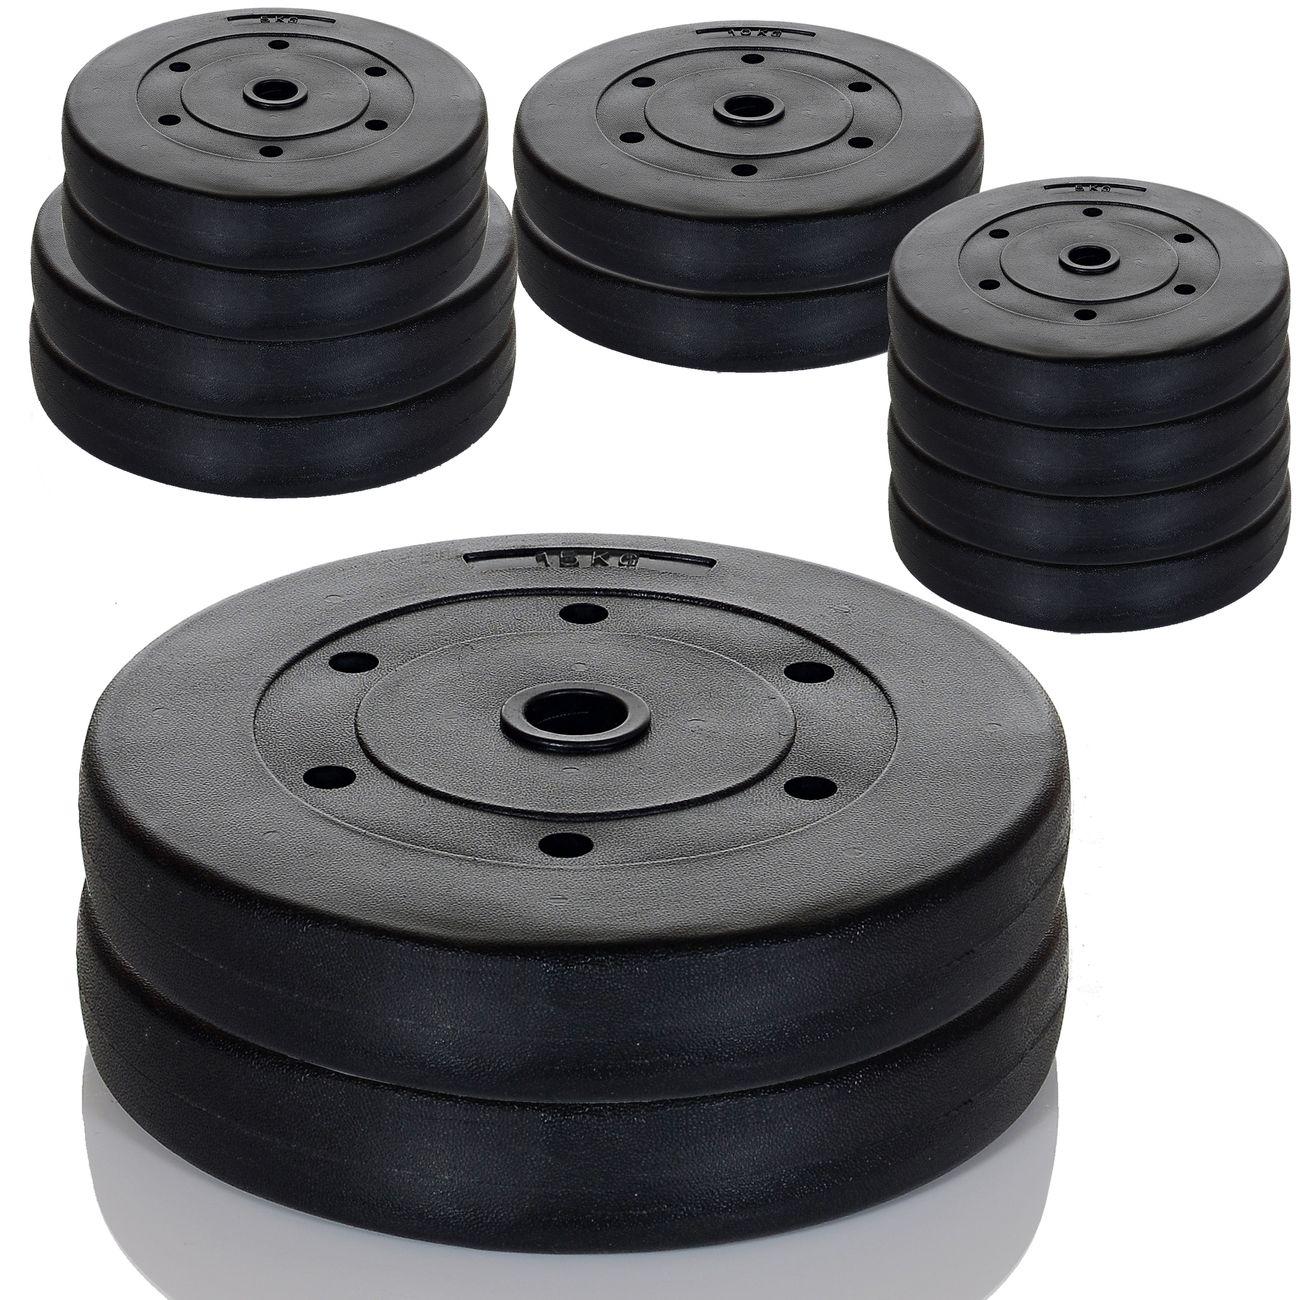 hantelscheiben gewichte 20 oder 30 kg set f r fitness. Black Bedroom Furniture Sets. Home Design Ideas